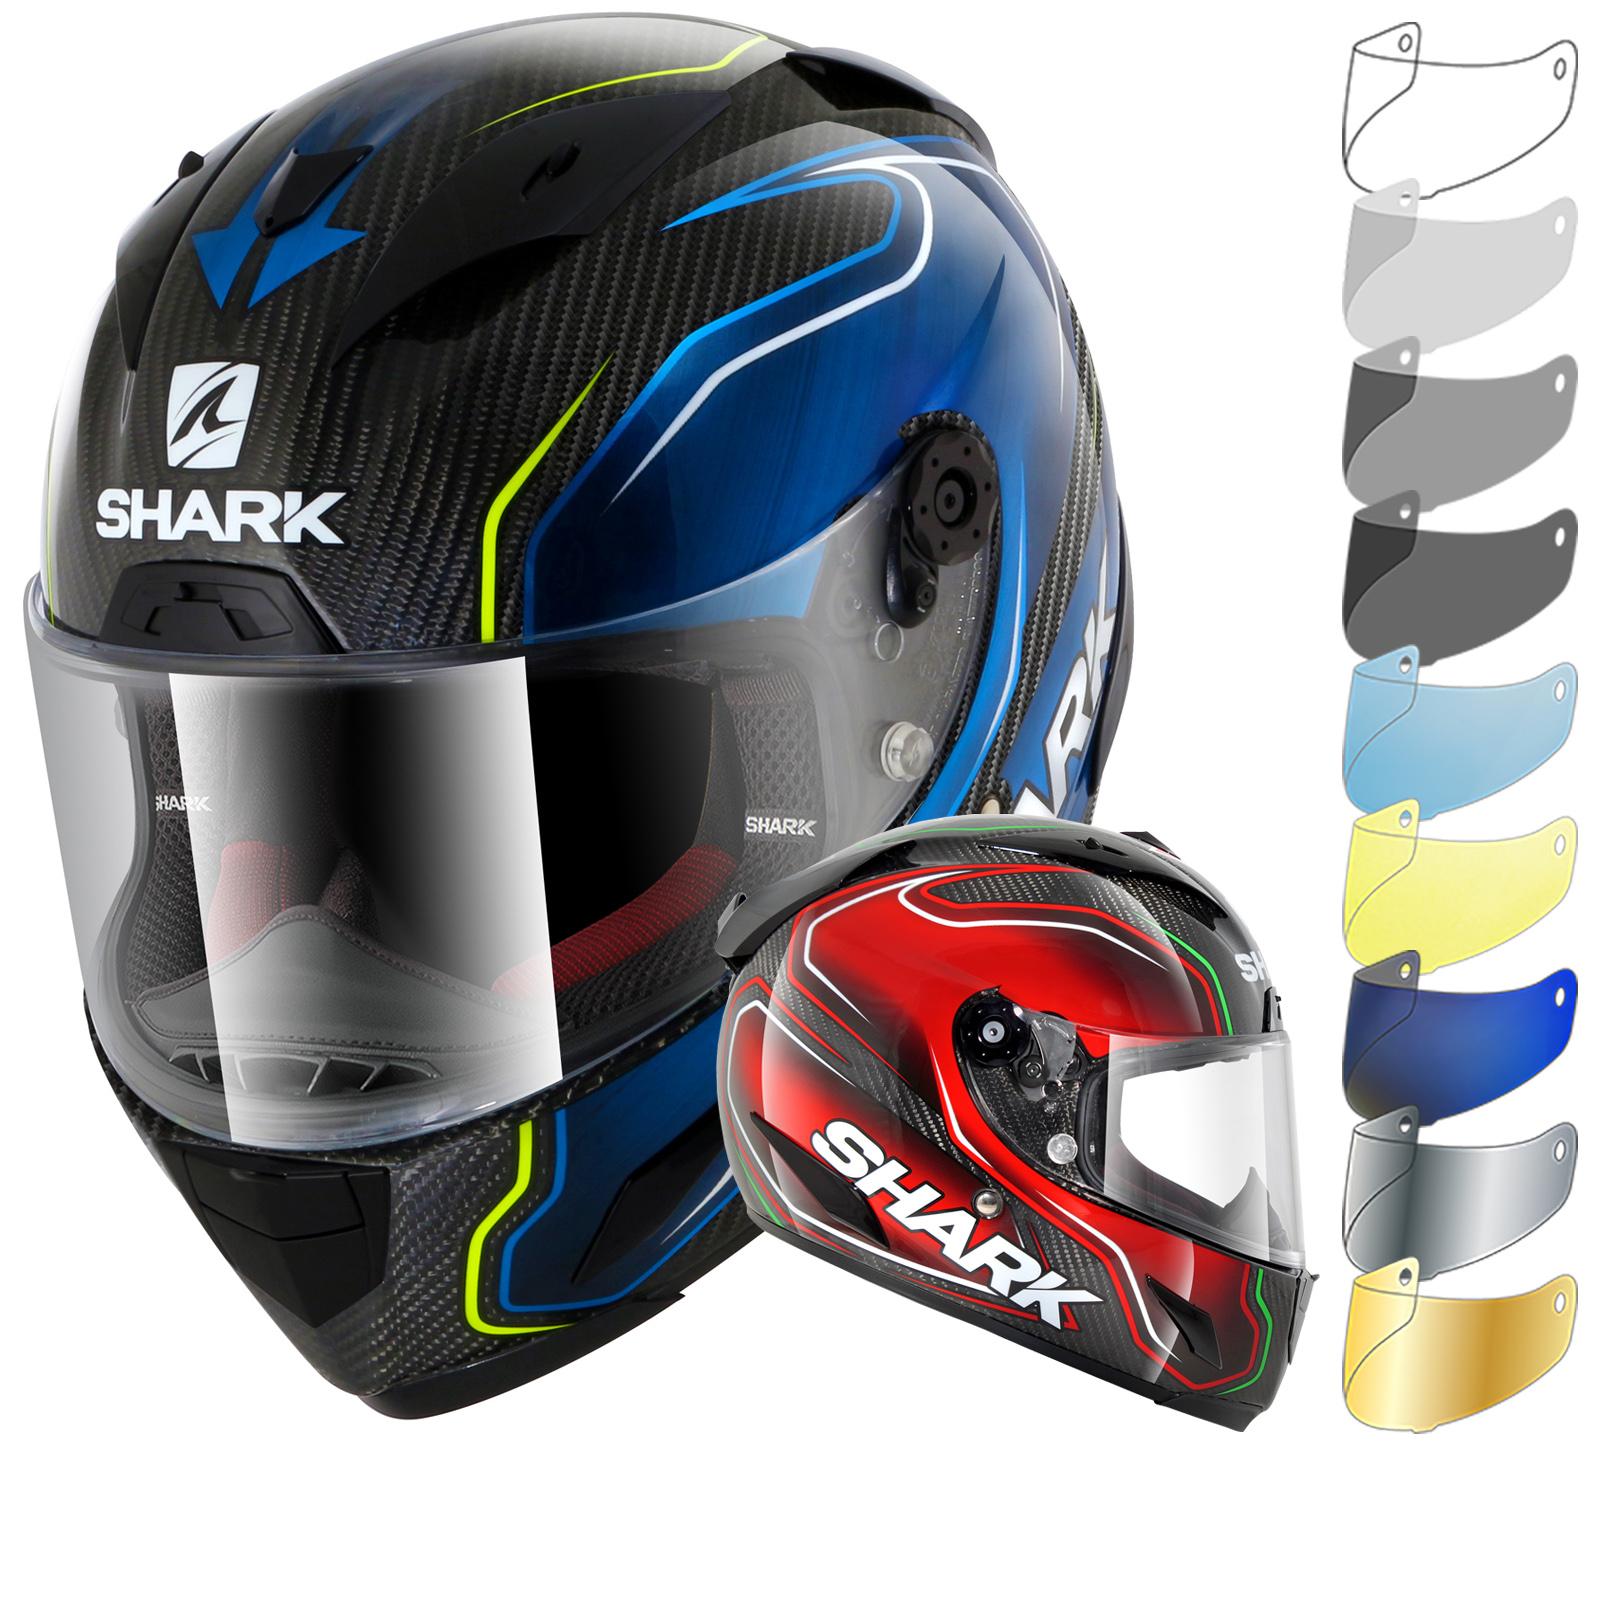 shark race r pro carbon guintoli motorcycle helmet visor full face helmets. Black Bedroom Furniture Sets. Home Design Ideas